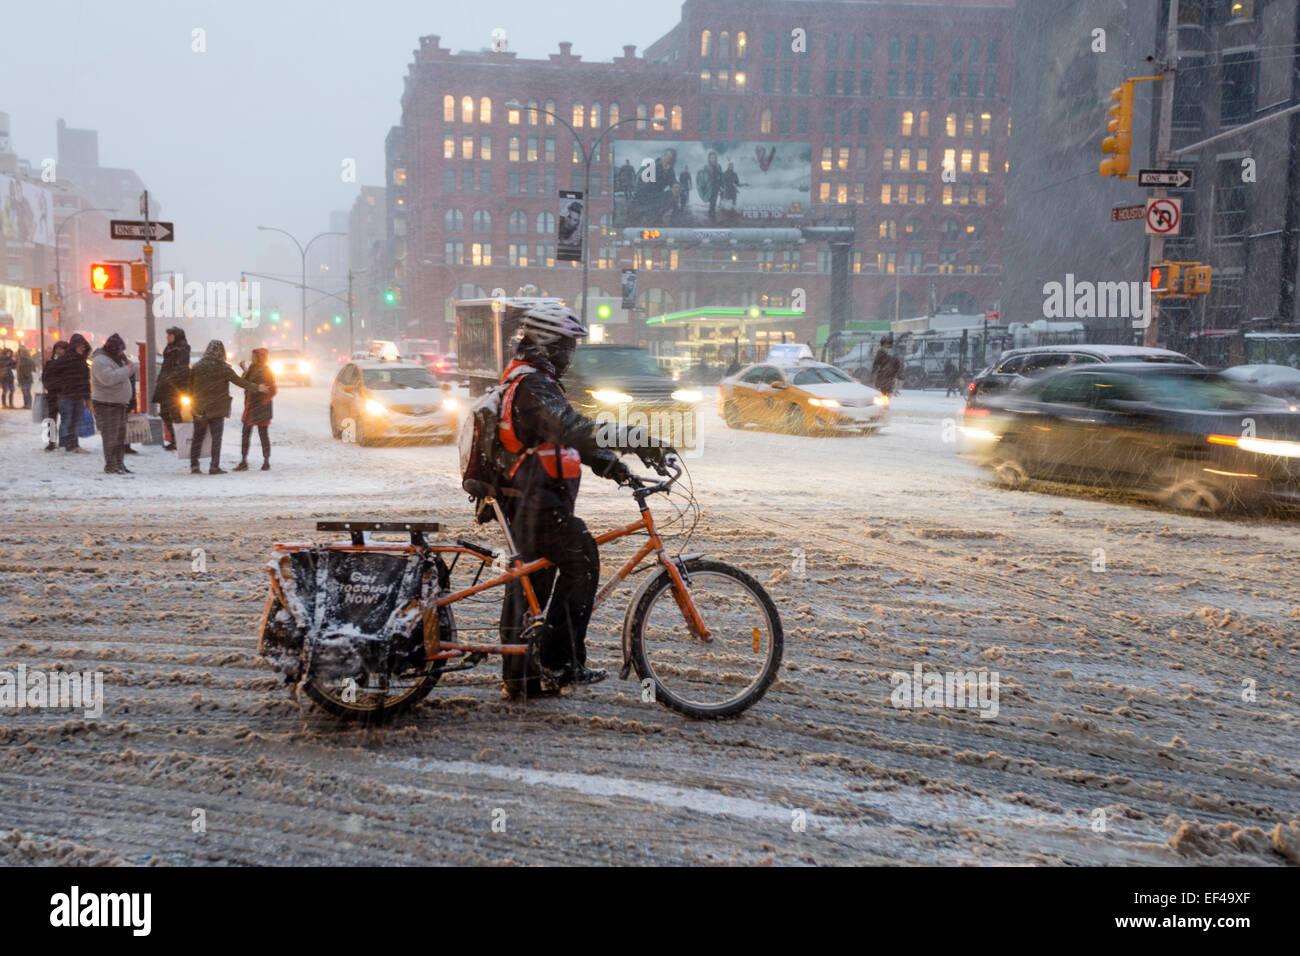 new-york-usa-26th-january-2015-snow-bega